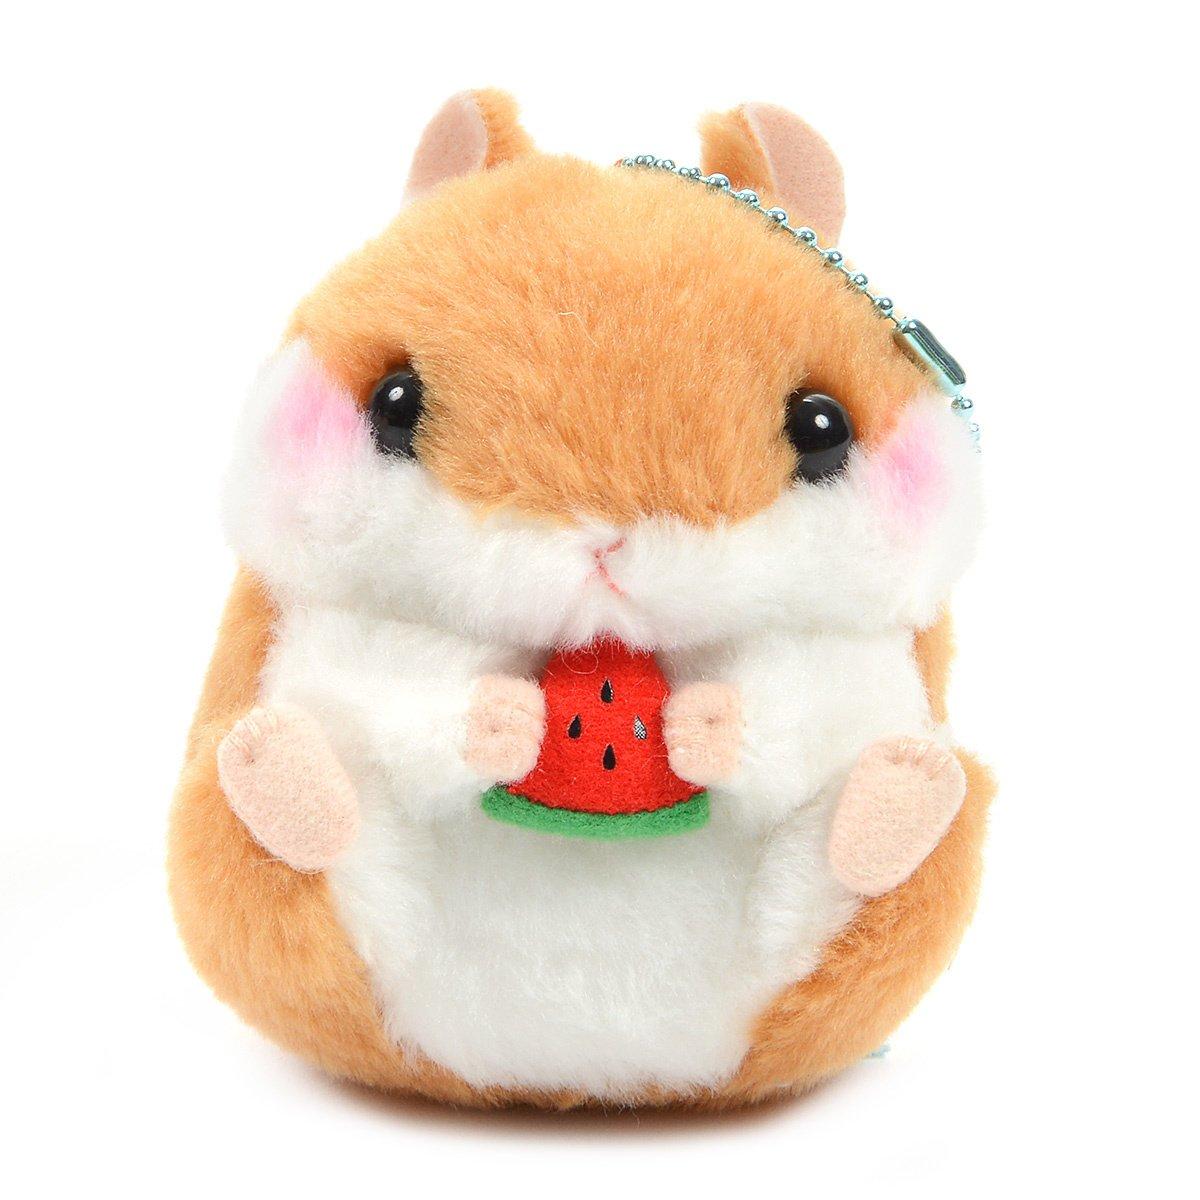 Plush Hamster, Amuse, Coroham Coron, Coron, Brown, 4 Inches